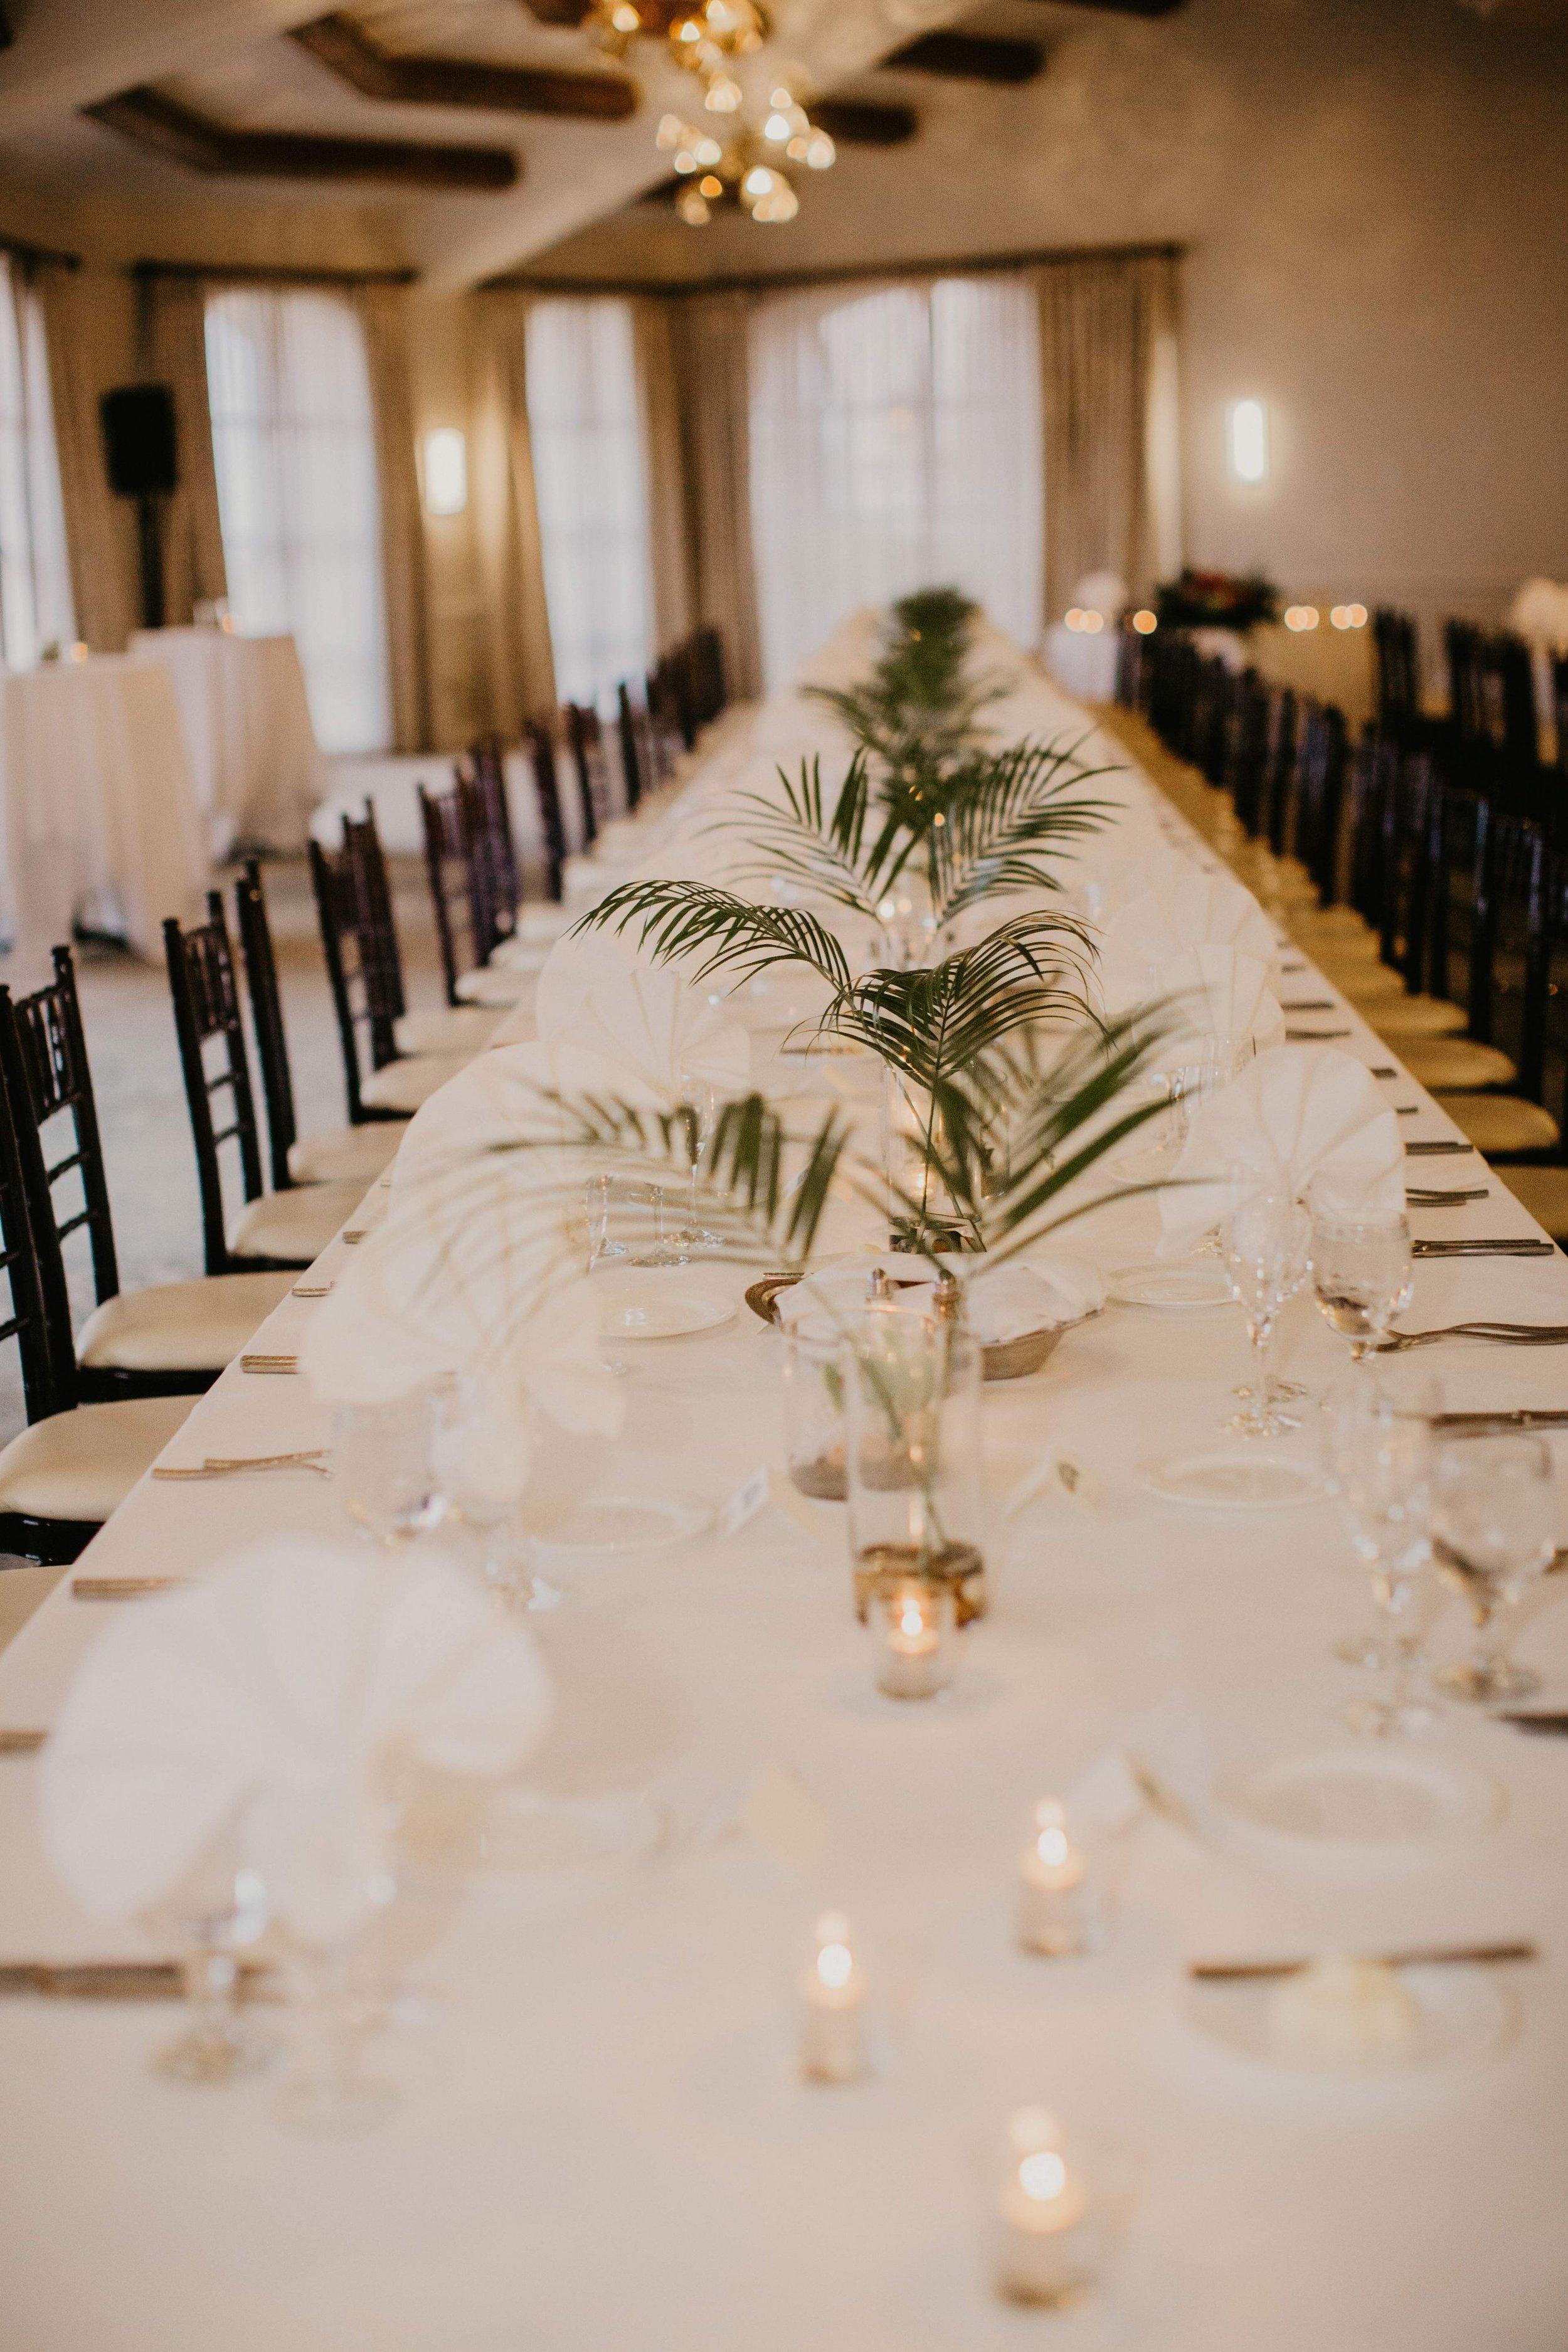 www.santabarbarawedding.com | Candice Marie Photography | Hilton Santa Barbara Beachfront Resort | Dalina Klan | Once in a Lifetime Weddings | Reception Tables